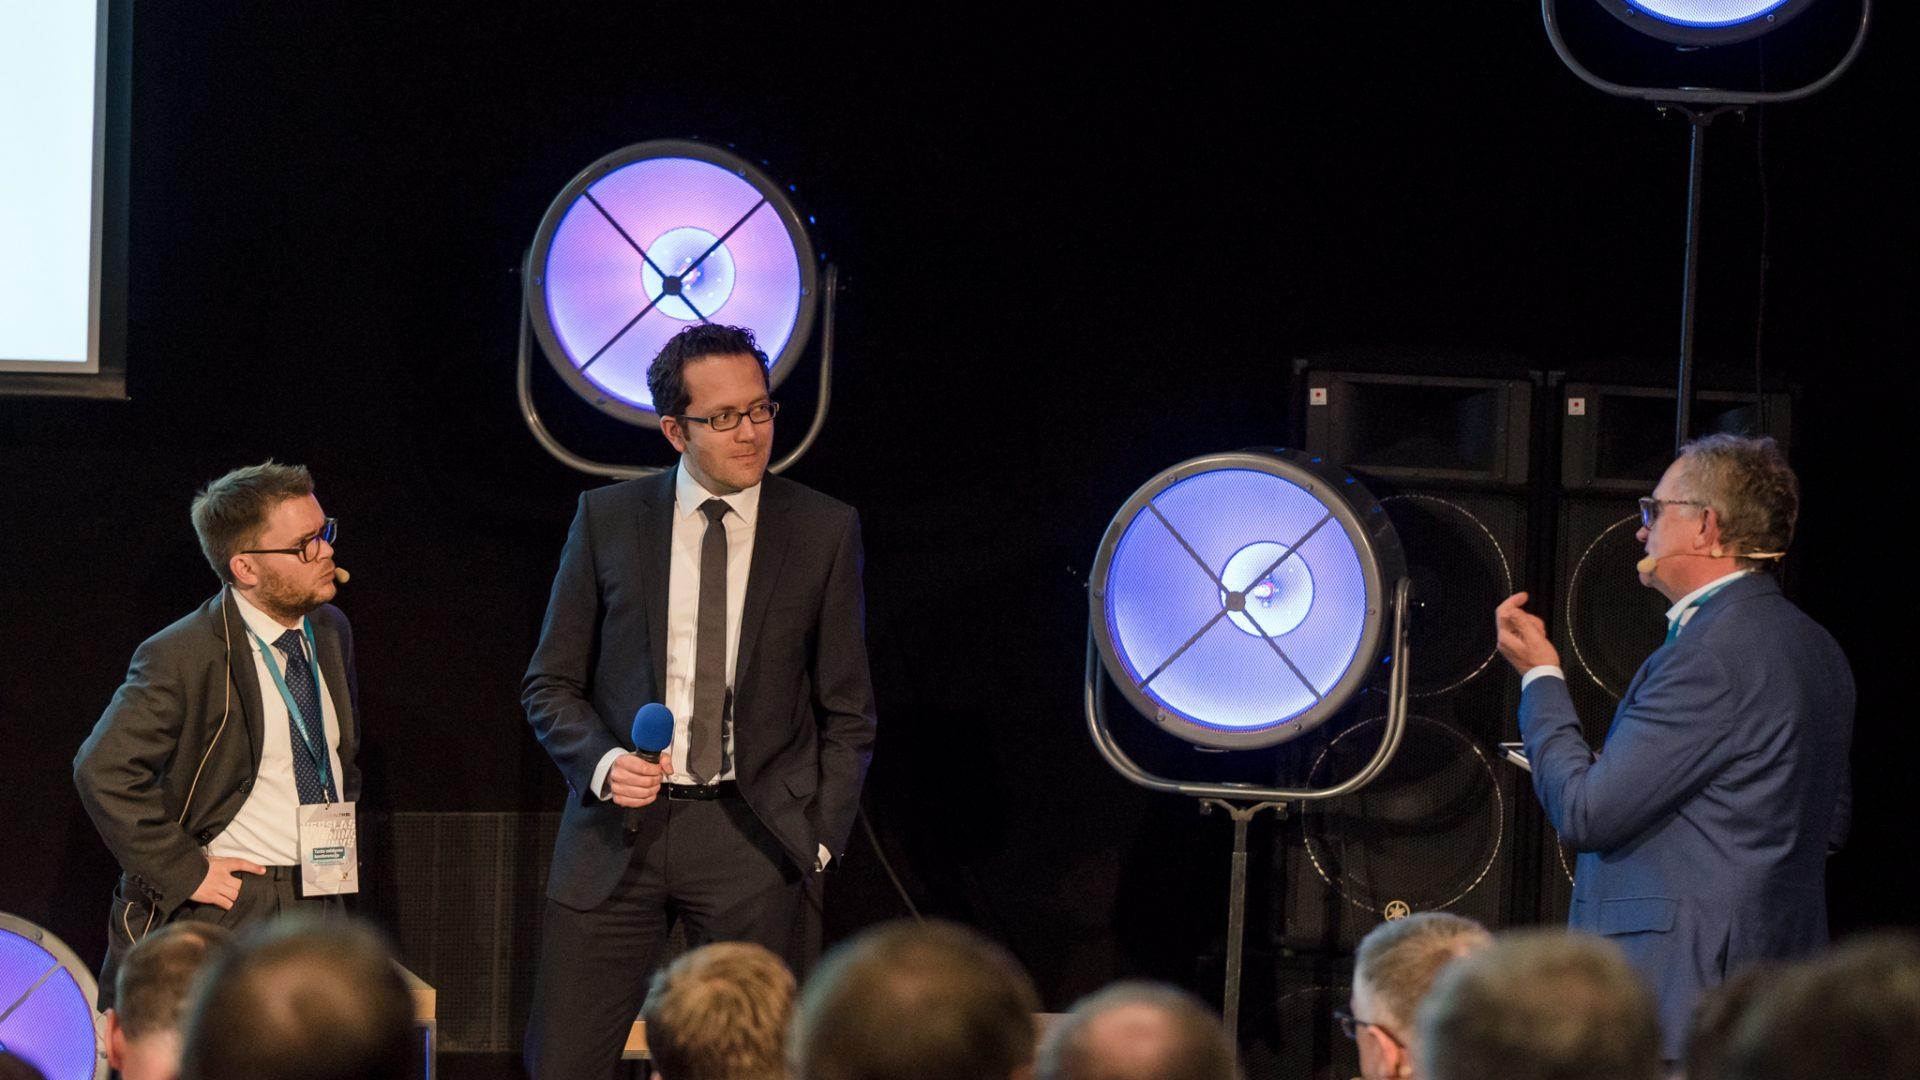 Dr. Jan Taenzler, Prof. Dr. Fabian Bernhard, Jonas Tamulis, Wealth360